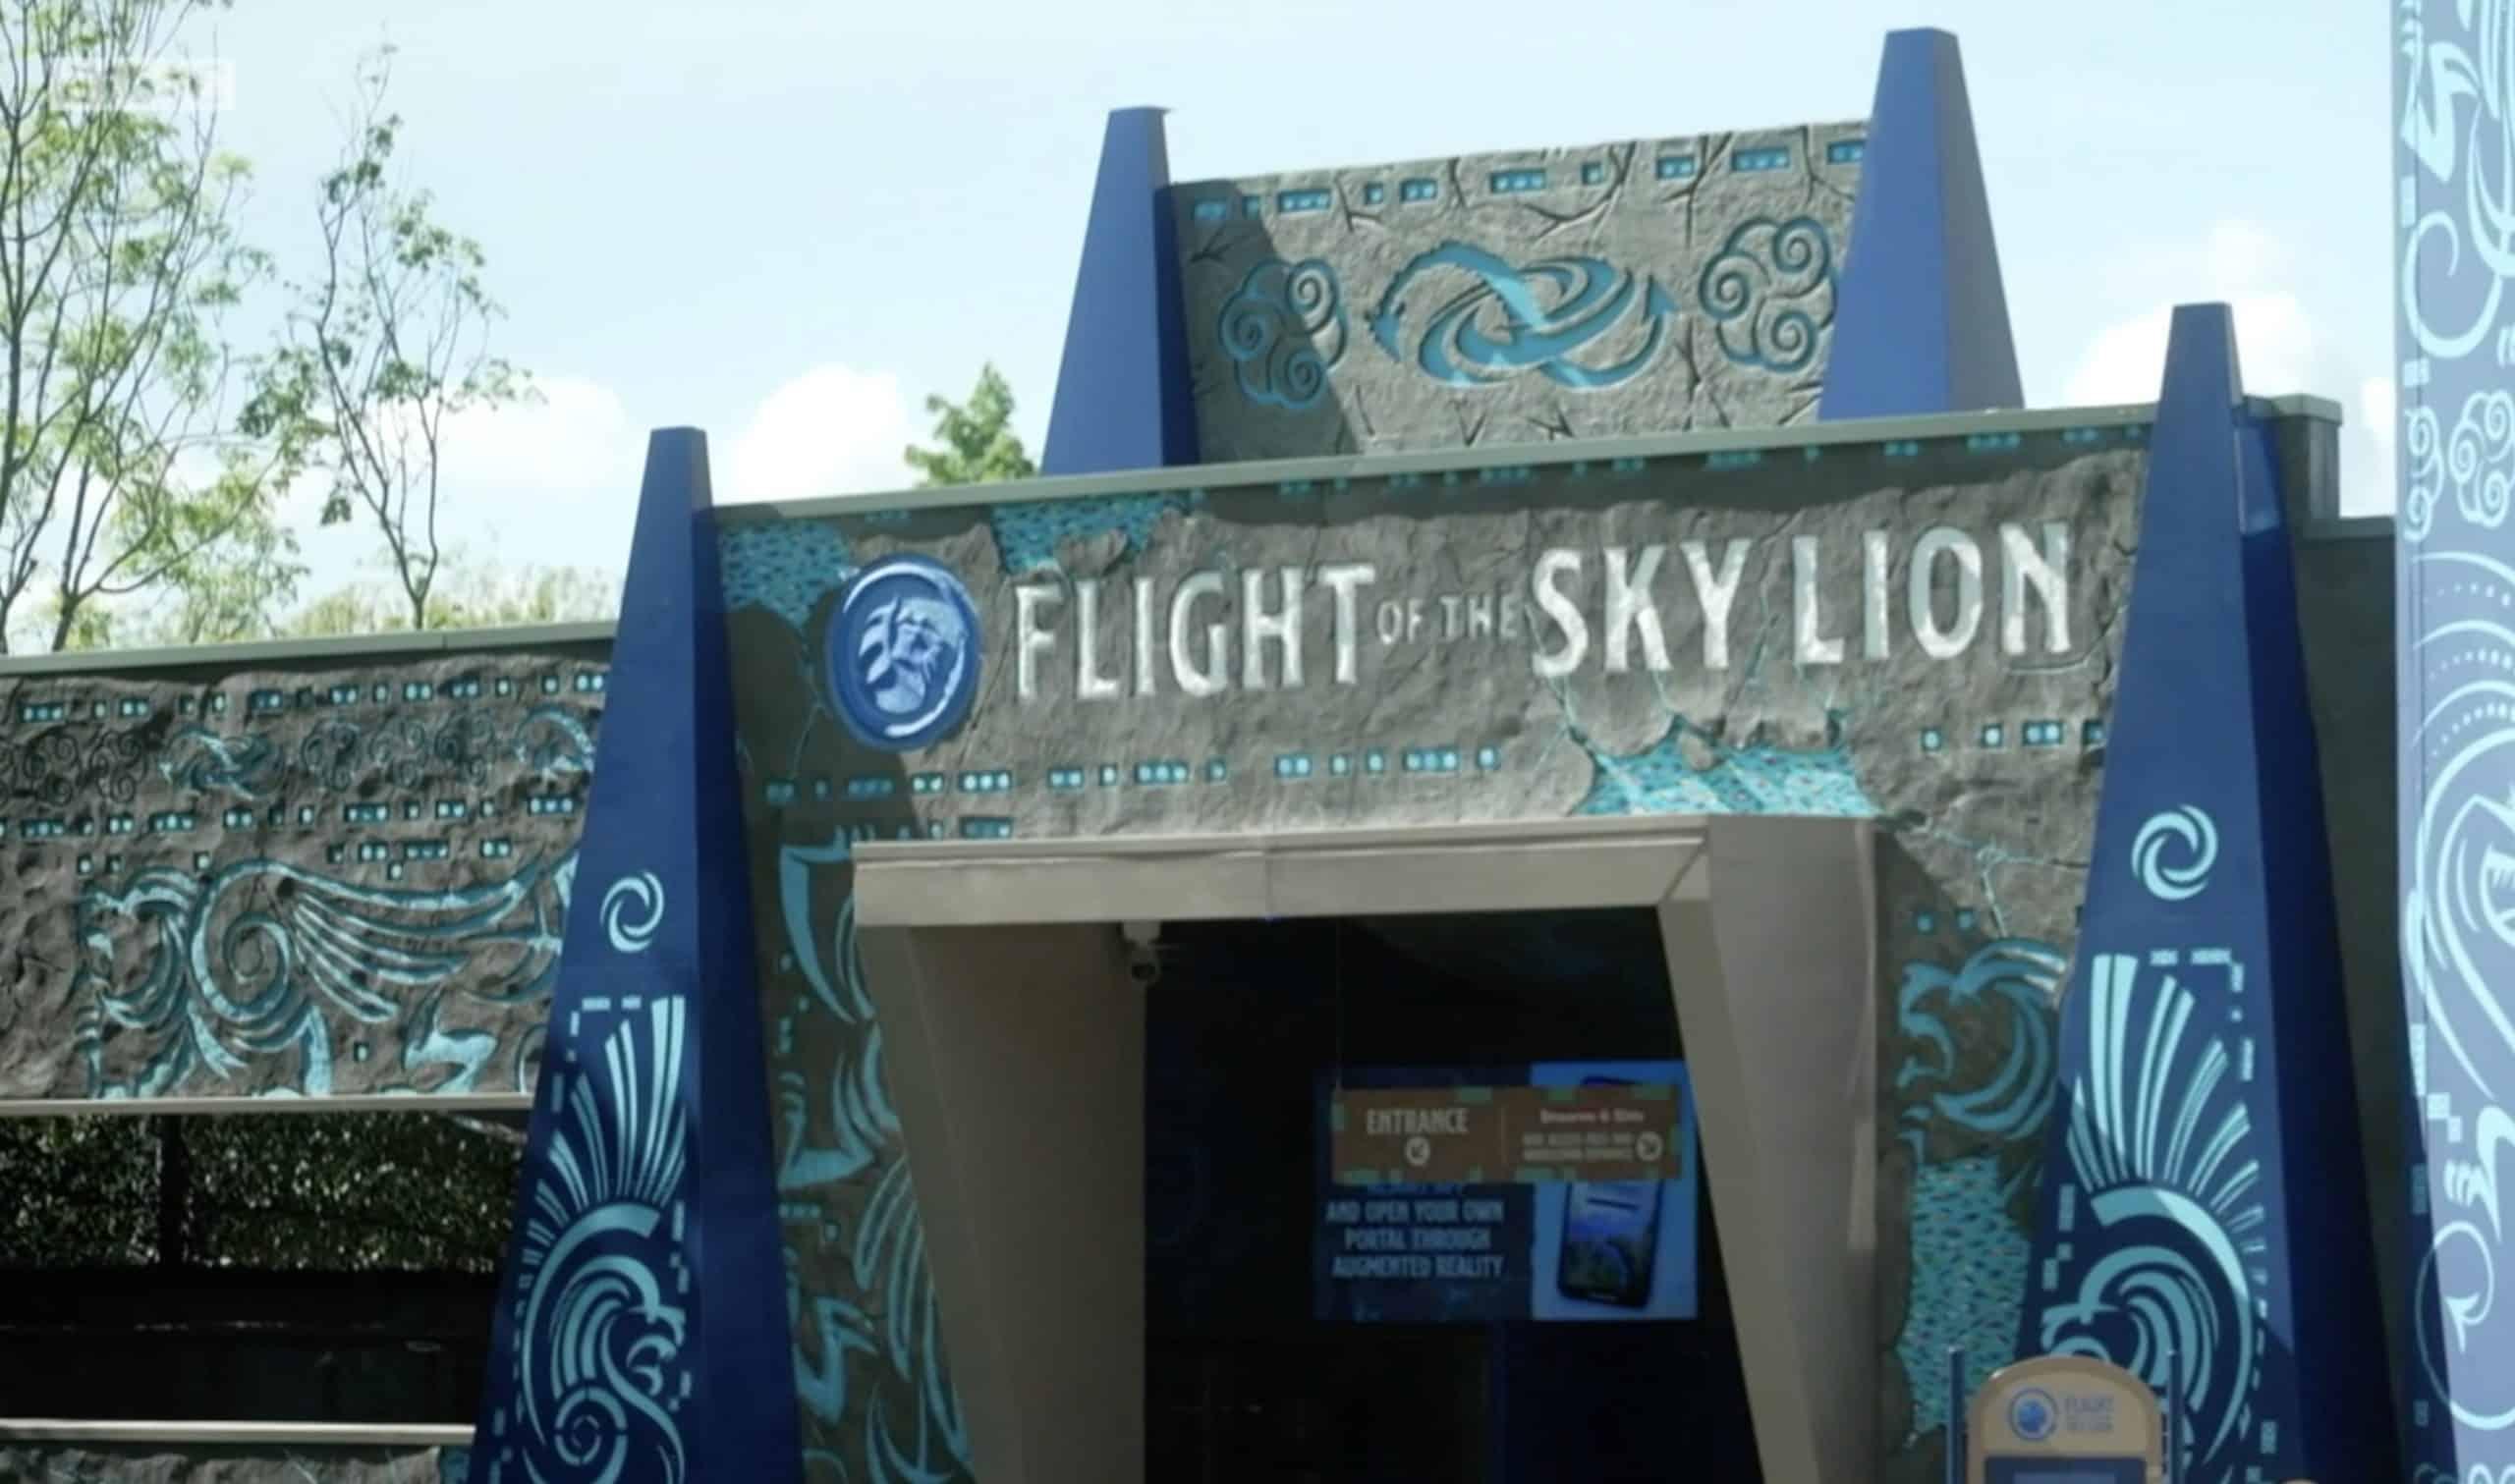 Flight the Sky Lion at Lego Land Winsor